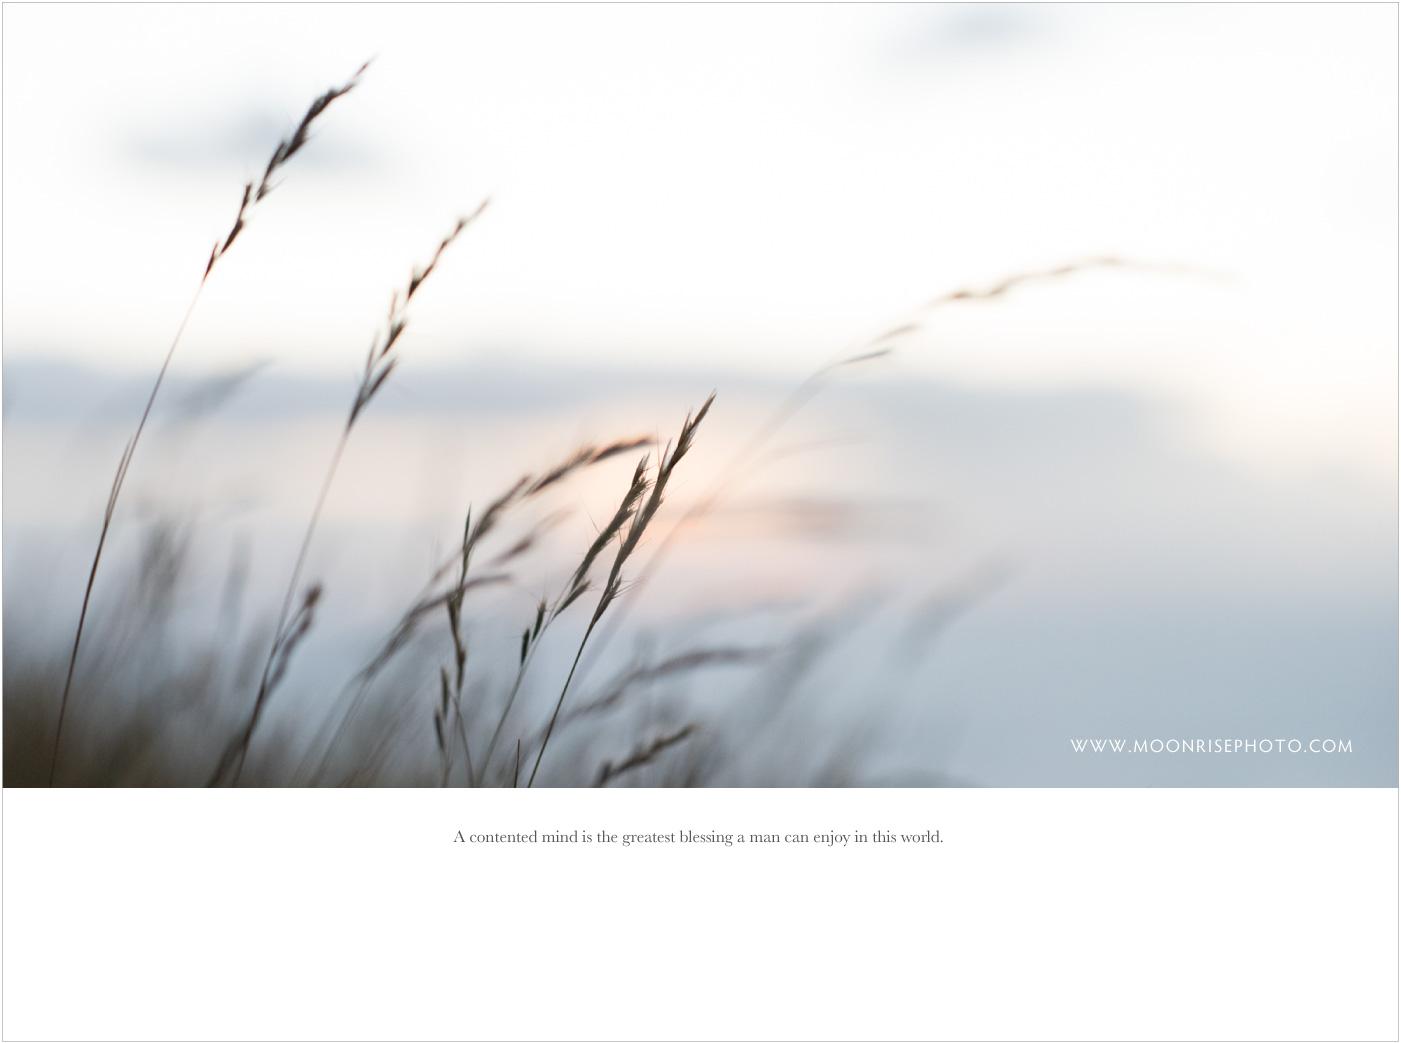 Moonrise_Prewedding